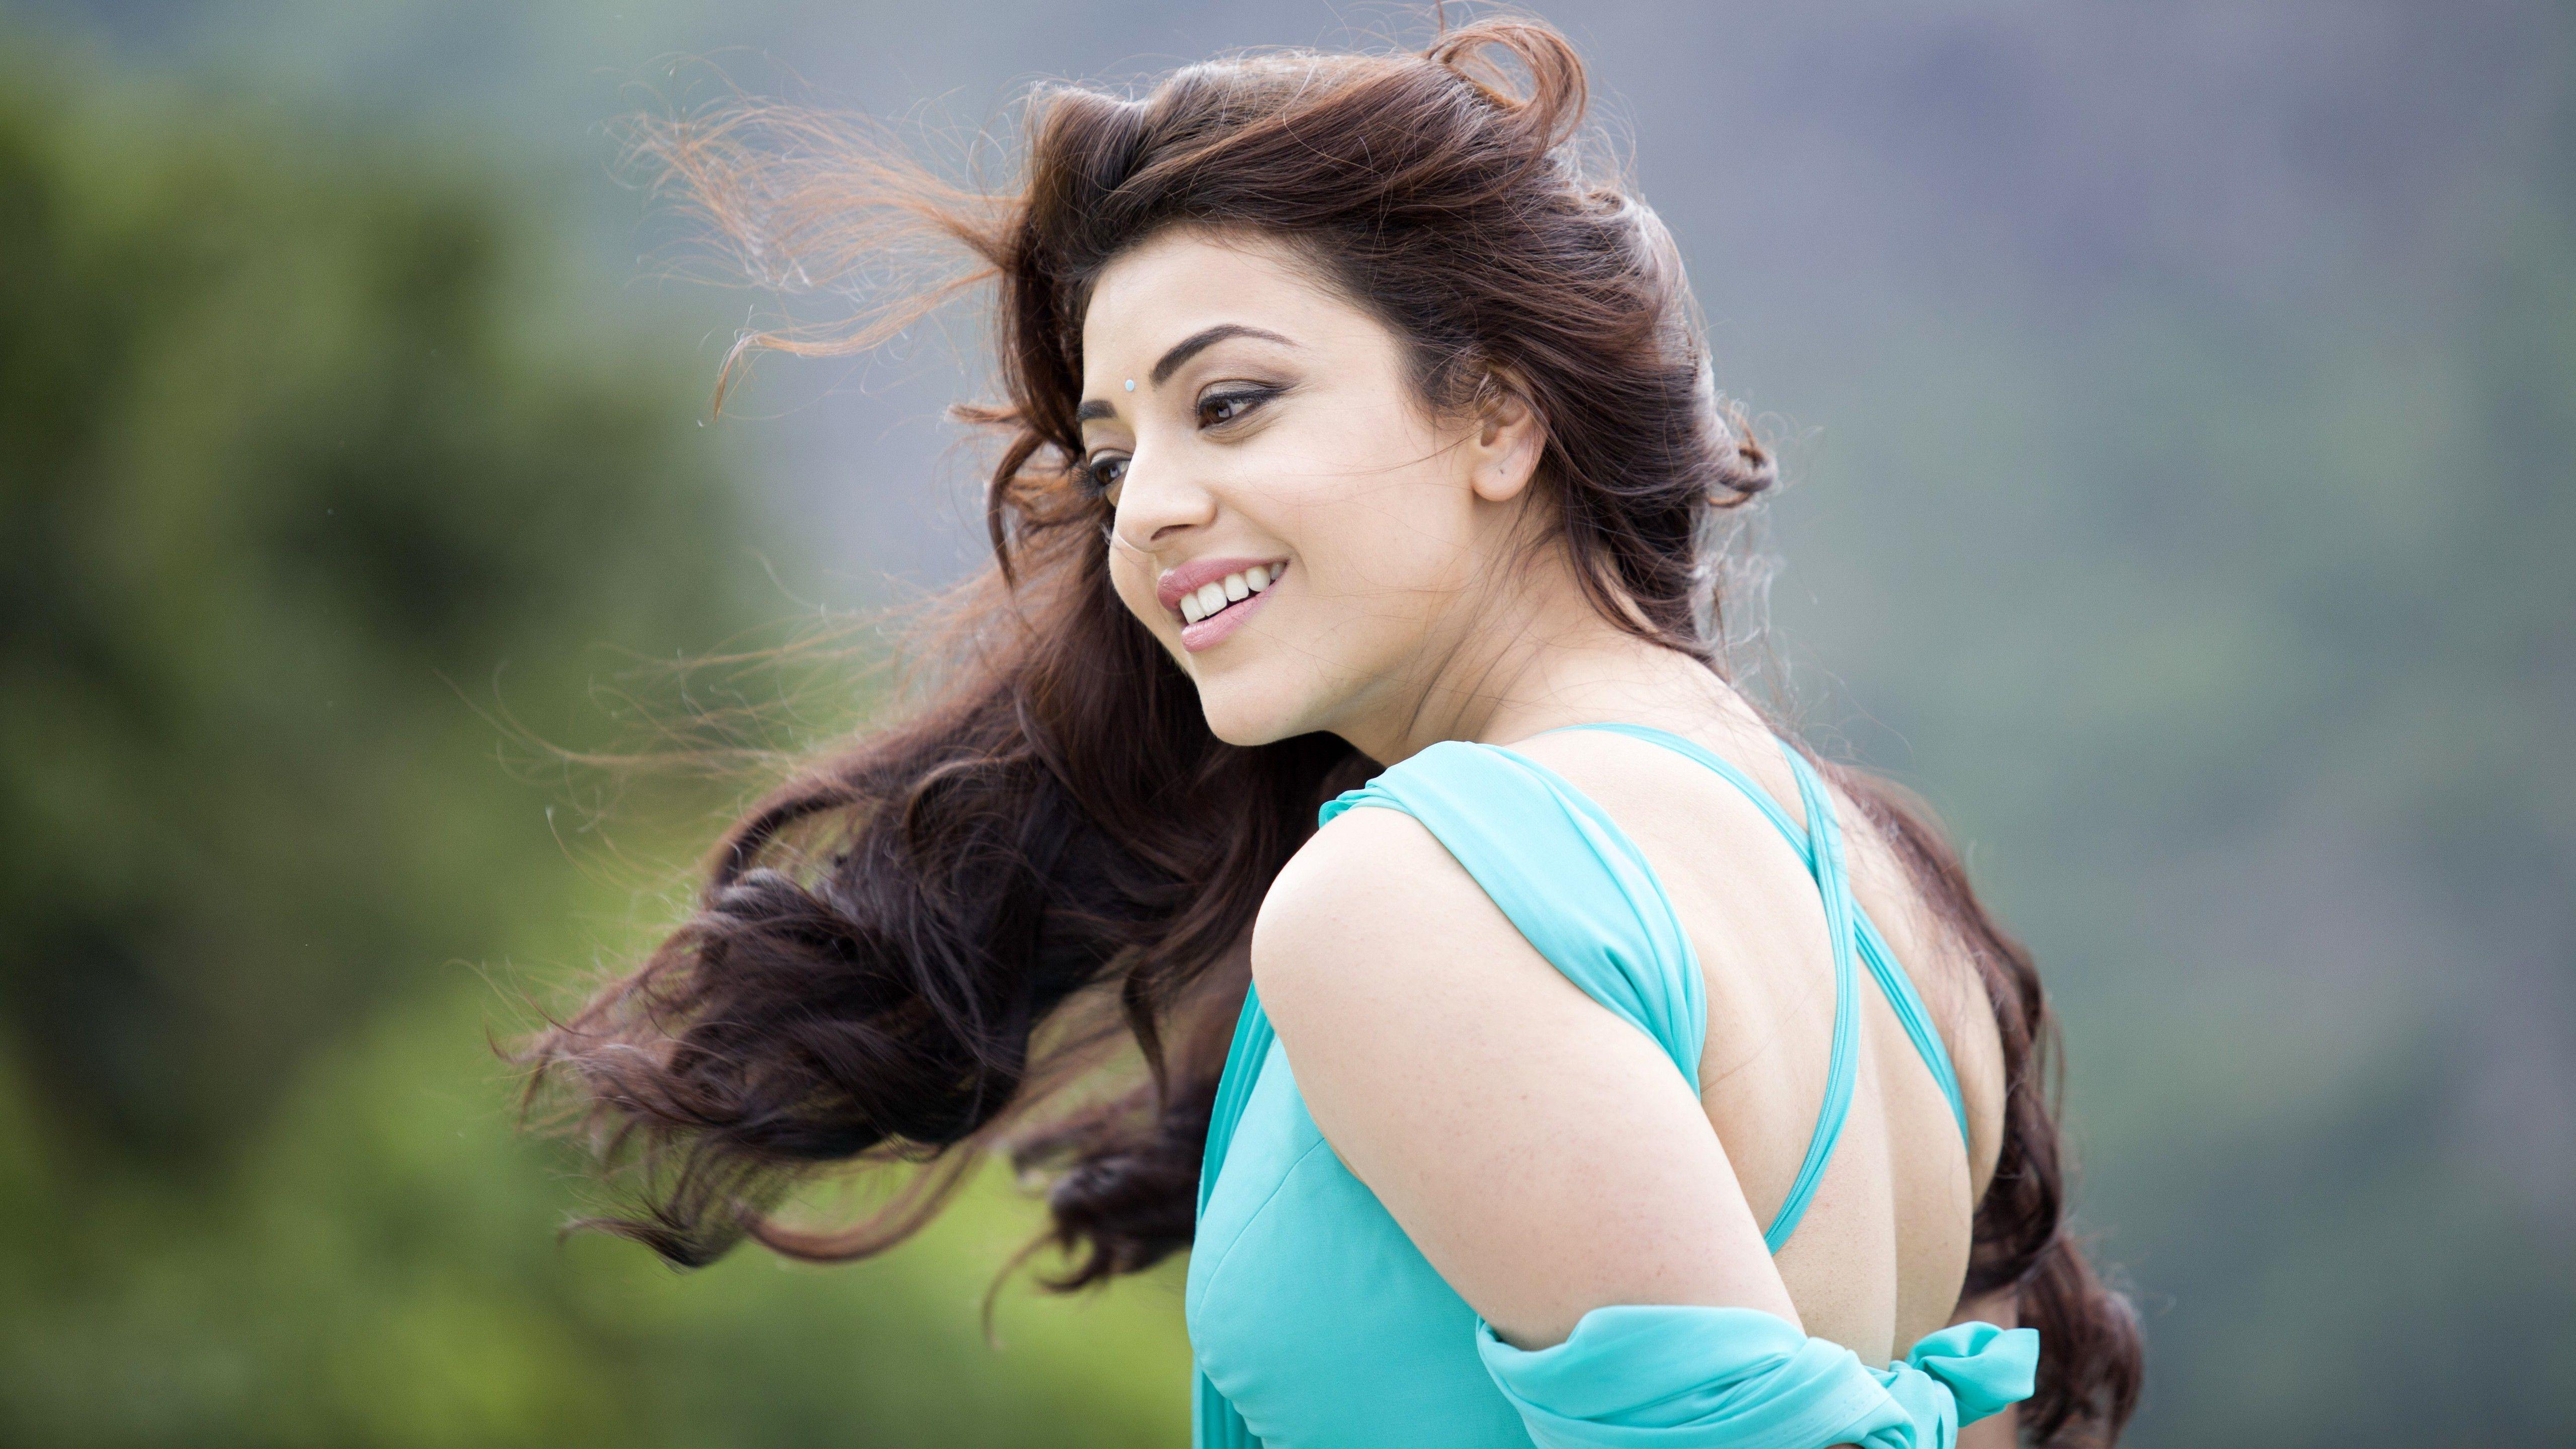 Indian Actress Wallpapers Page Hd Wallpapers Kajal Agarwal Bikini Bikini Pictures Hot Beauty